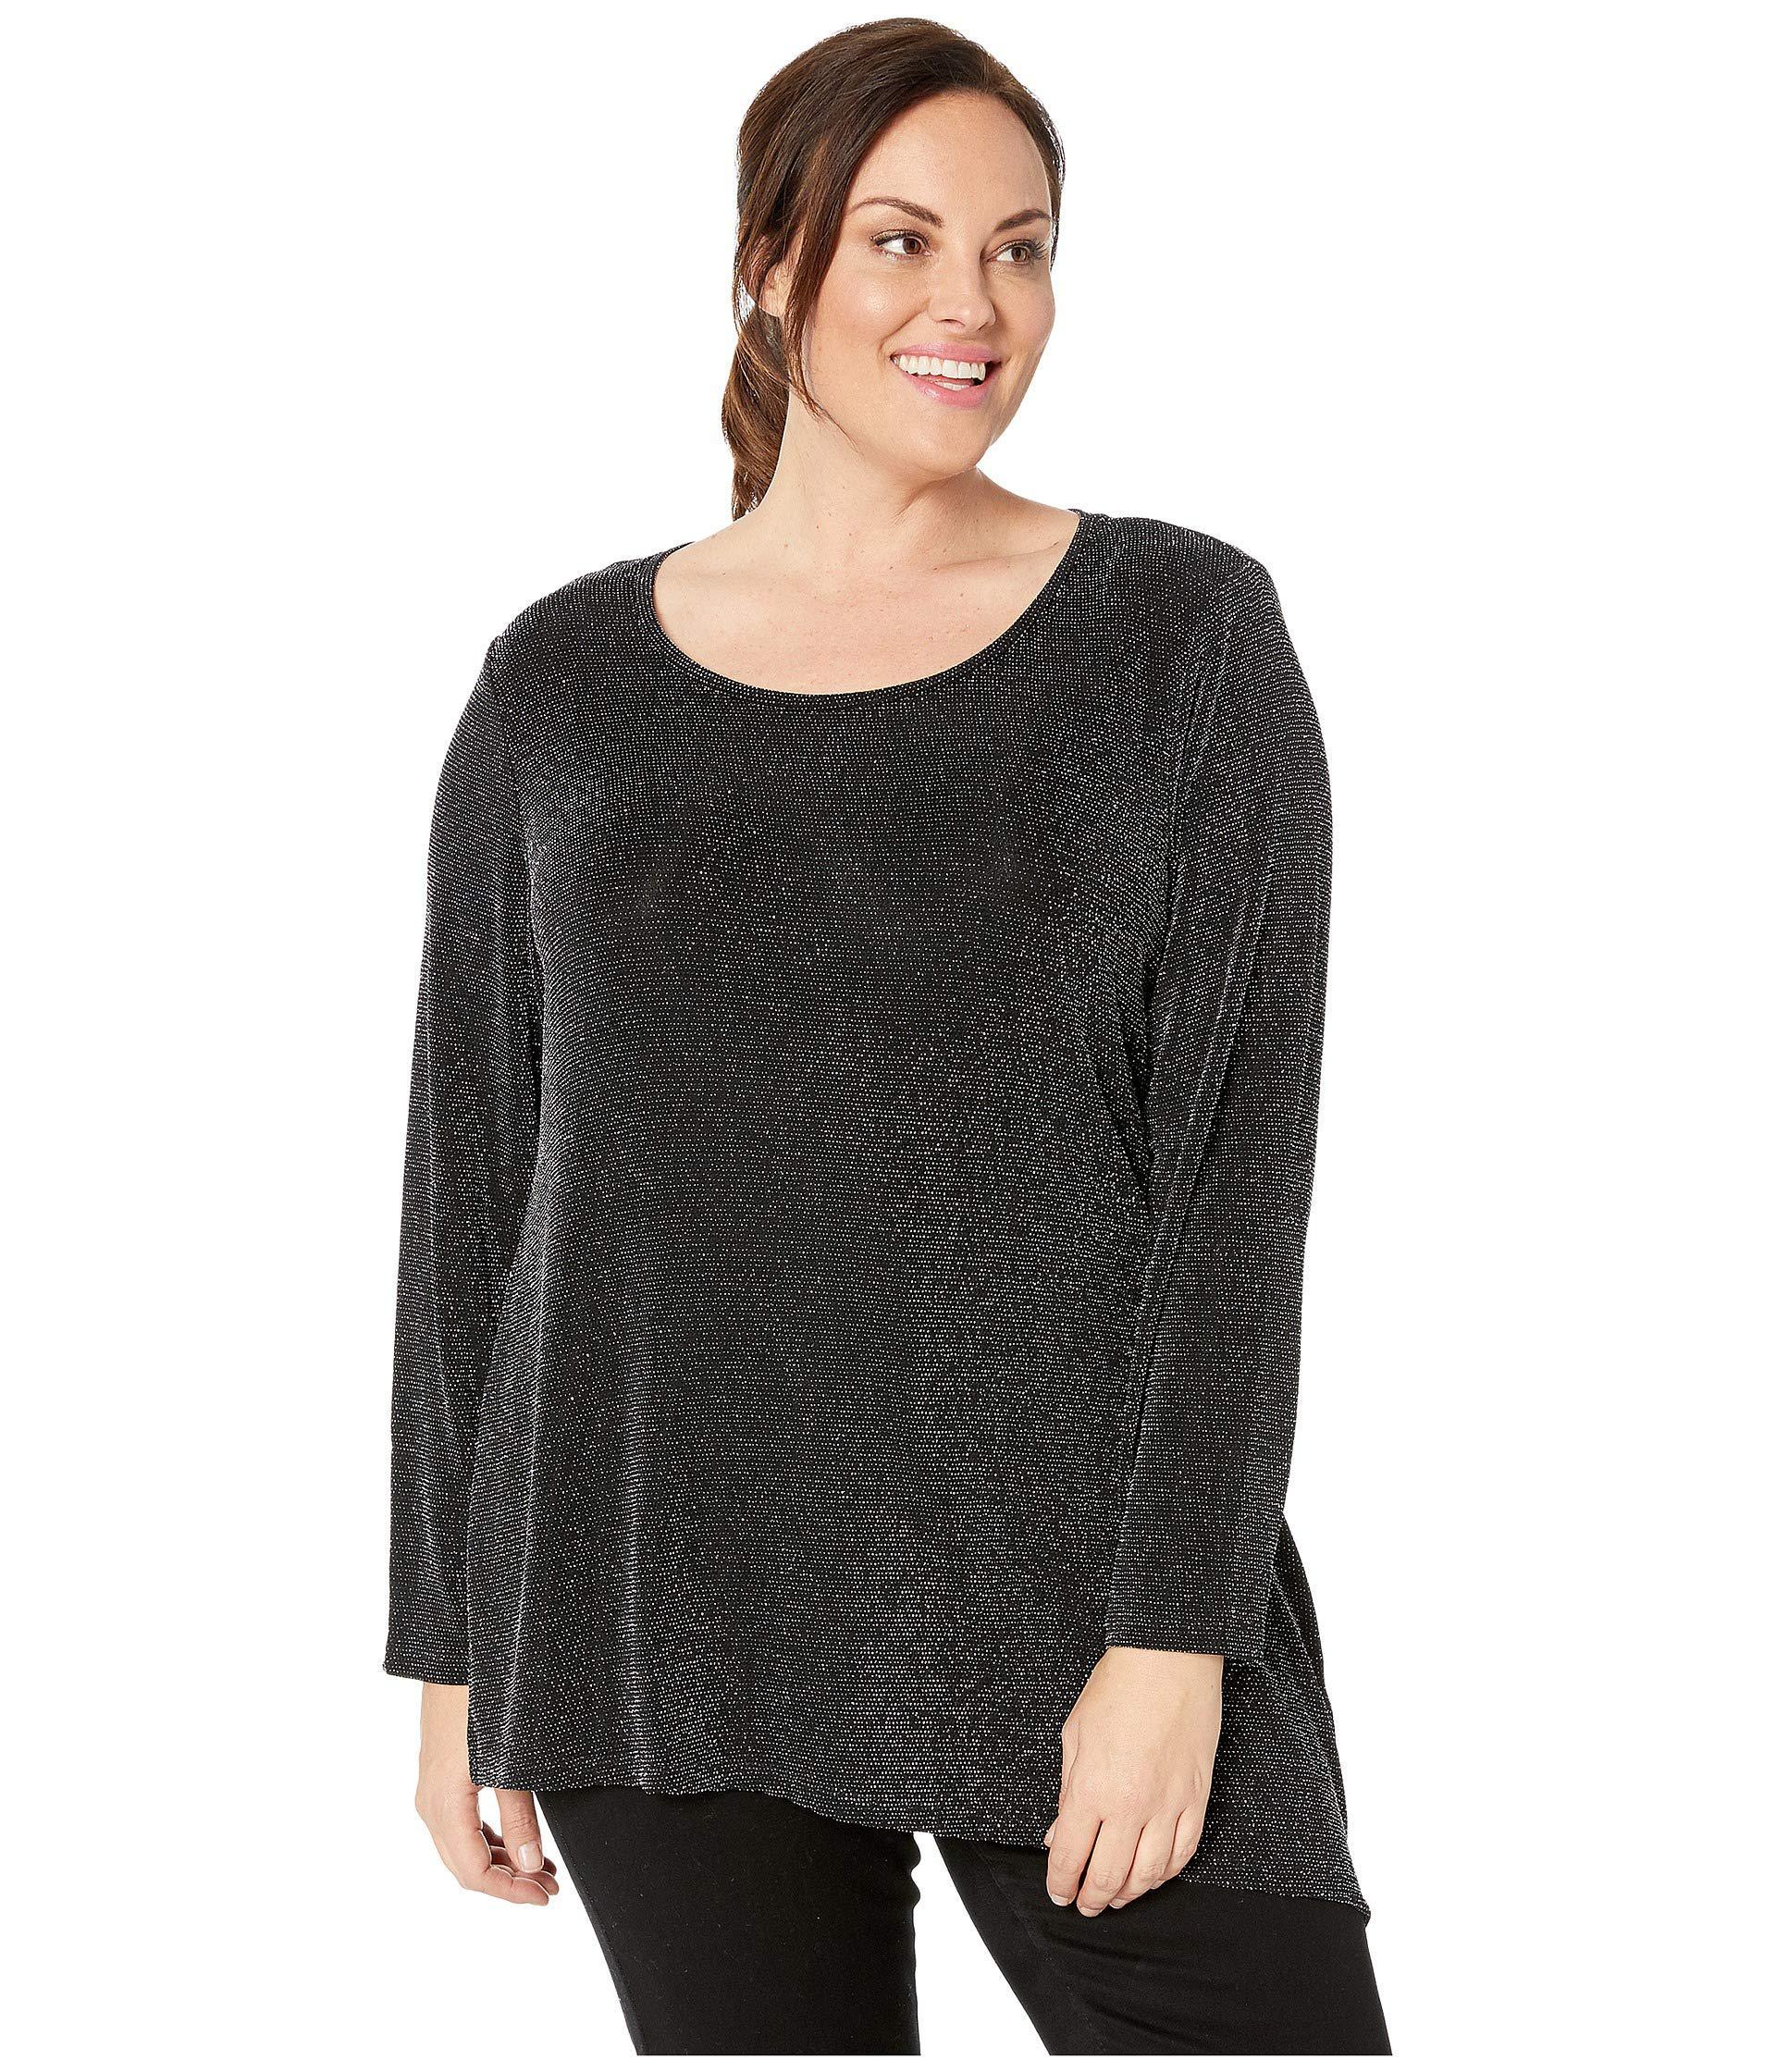 48badce9e6f05 Lyst - Calvin Klein Plus Size Long Sleeve Asymmetric Metallic Top ...